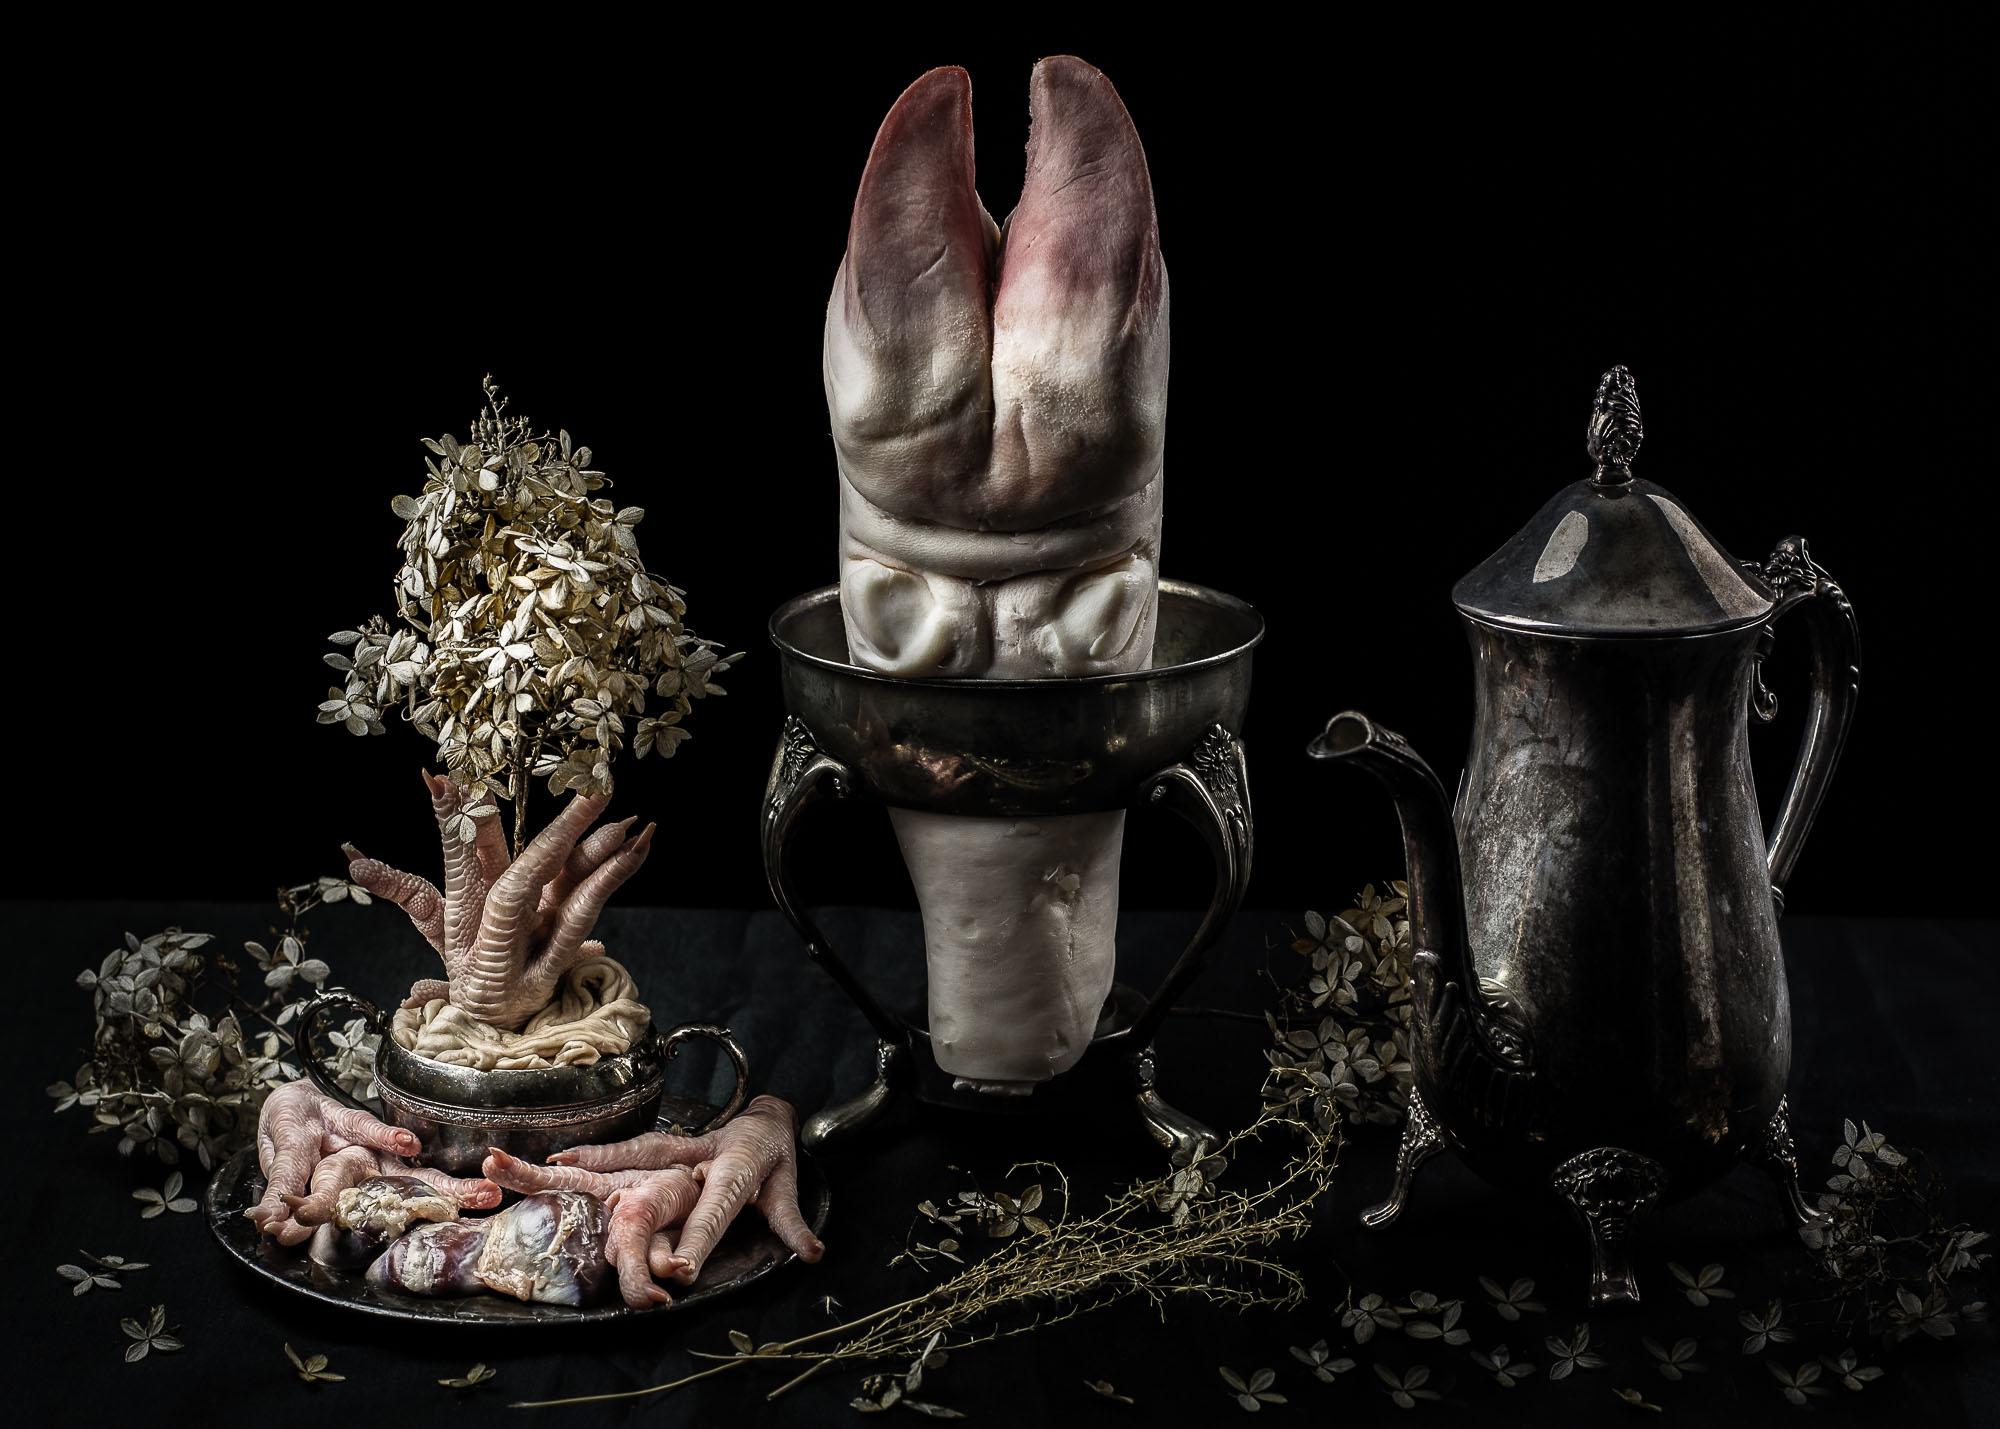 Still life arrangement of cow foot, chicken feet, duck gizzards, pig intestines, dead flowers, and tea set.